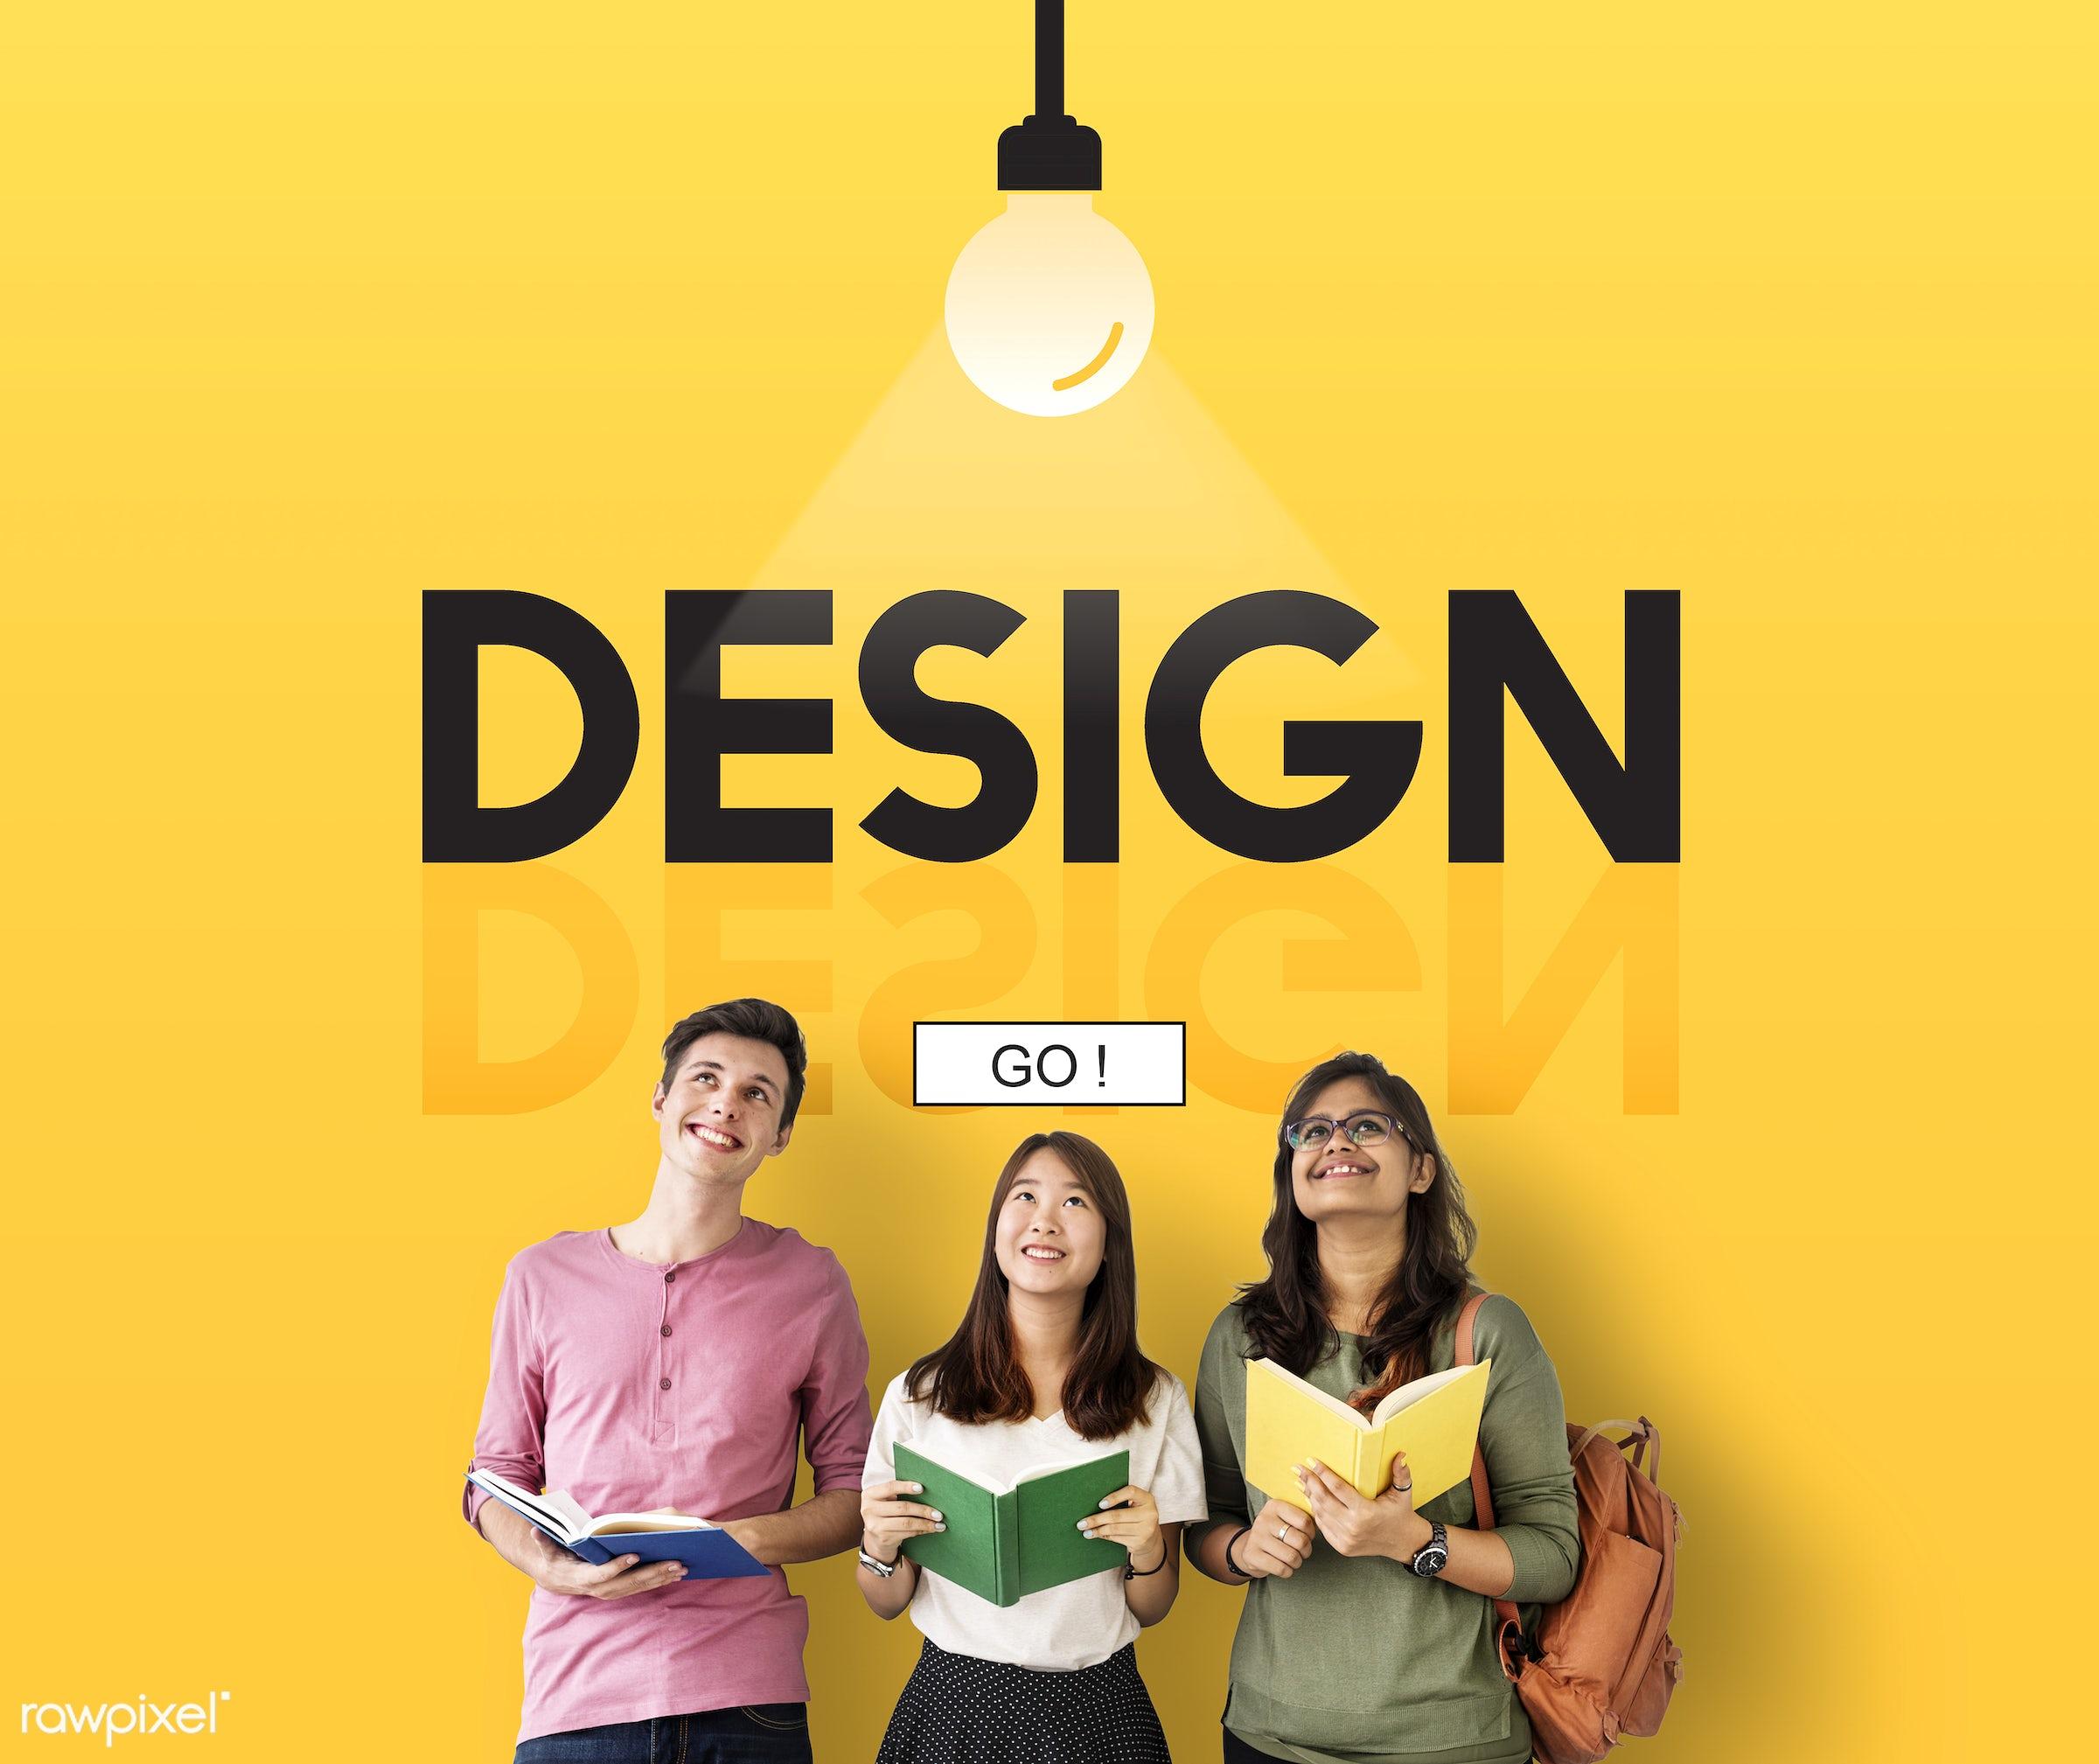 Design ideas - create, creative, action, african descent, asian, aspirations, be creative, book, brainstorm, caucasian,...